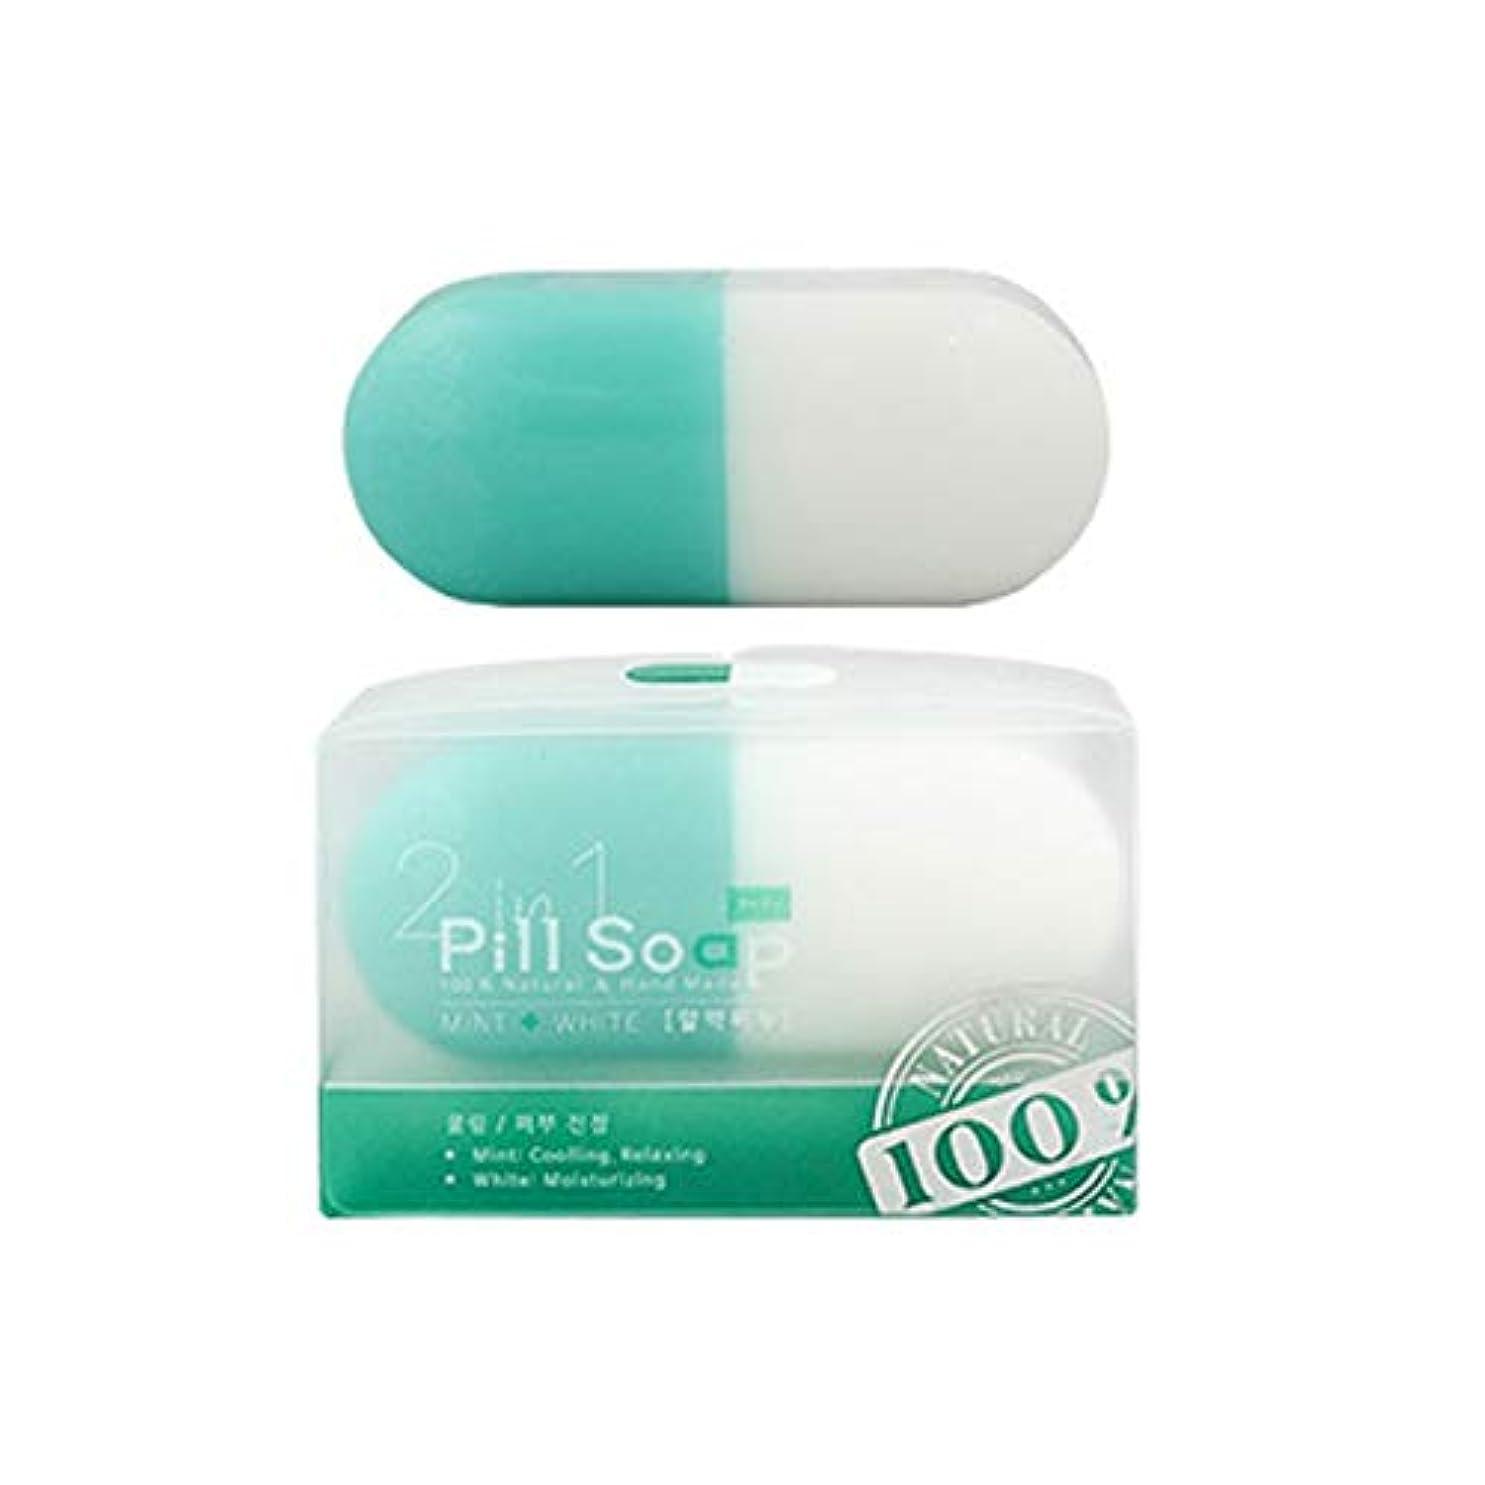 MINI RABBIT ミニラビット カプセルソープ 100g 韓国コスメ 皮脂 角質 美白 石けん ミント